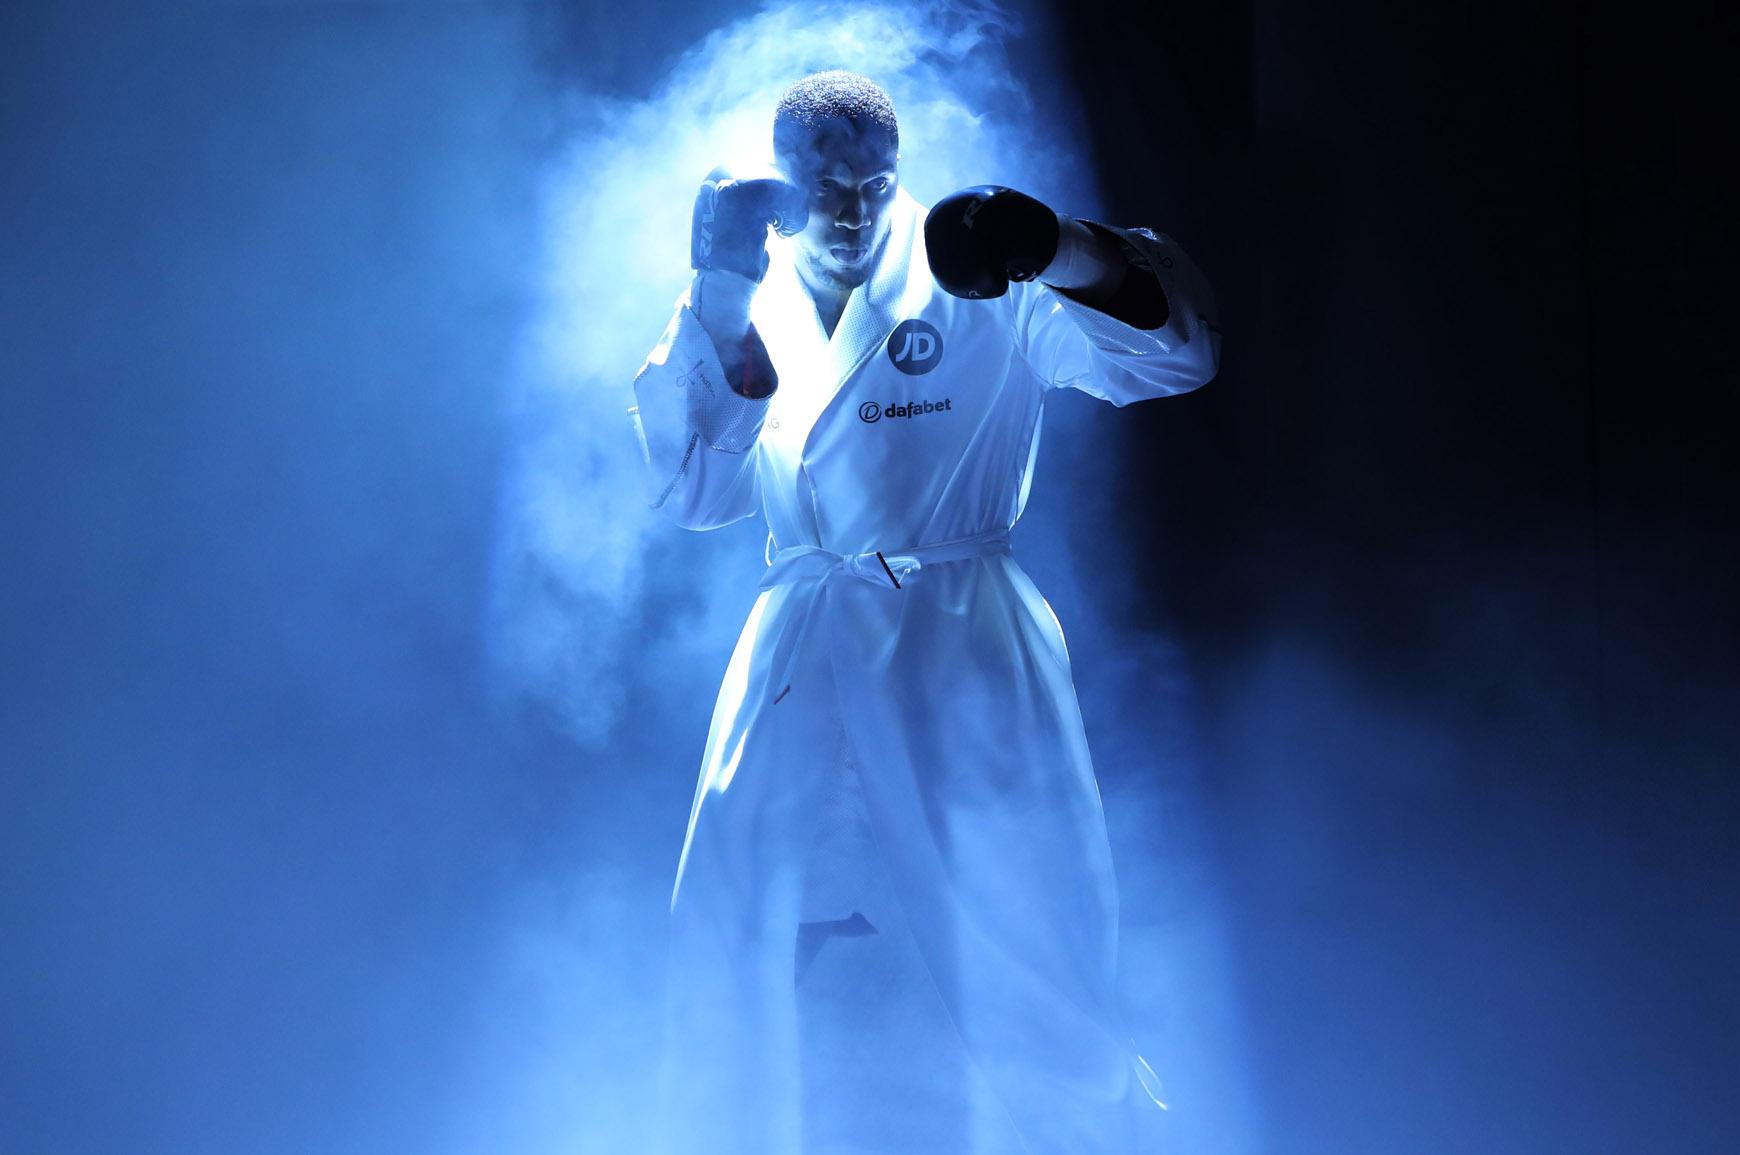 JOSHUA -PARKER PROMOTION PRINCIPALITY STADIUM,, CARDIFF,WALES PIC LAWRENCE LUSTIG WBA,IBF,WBO,IBO HEAVY TITLE ANTHONY JOSHUA V JOSEPH PARKER